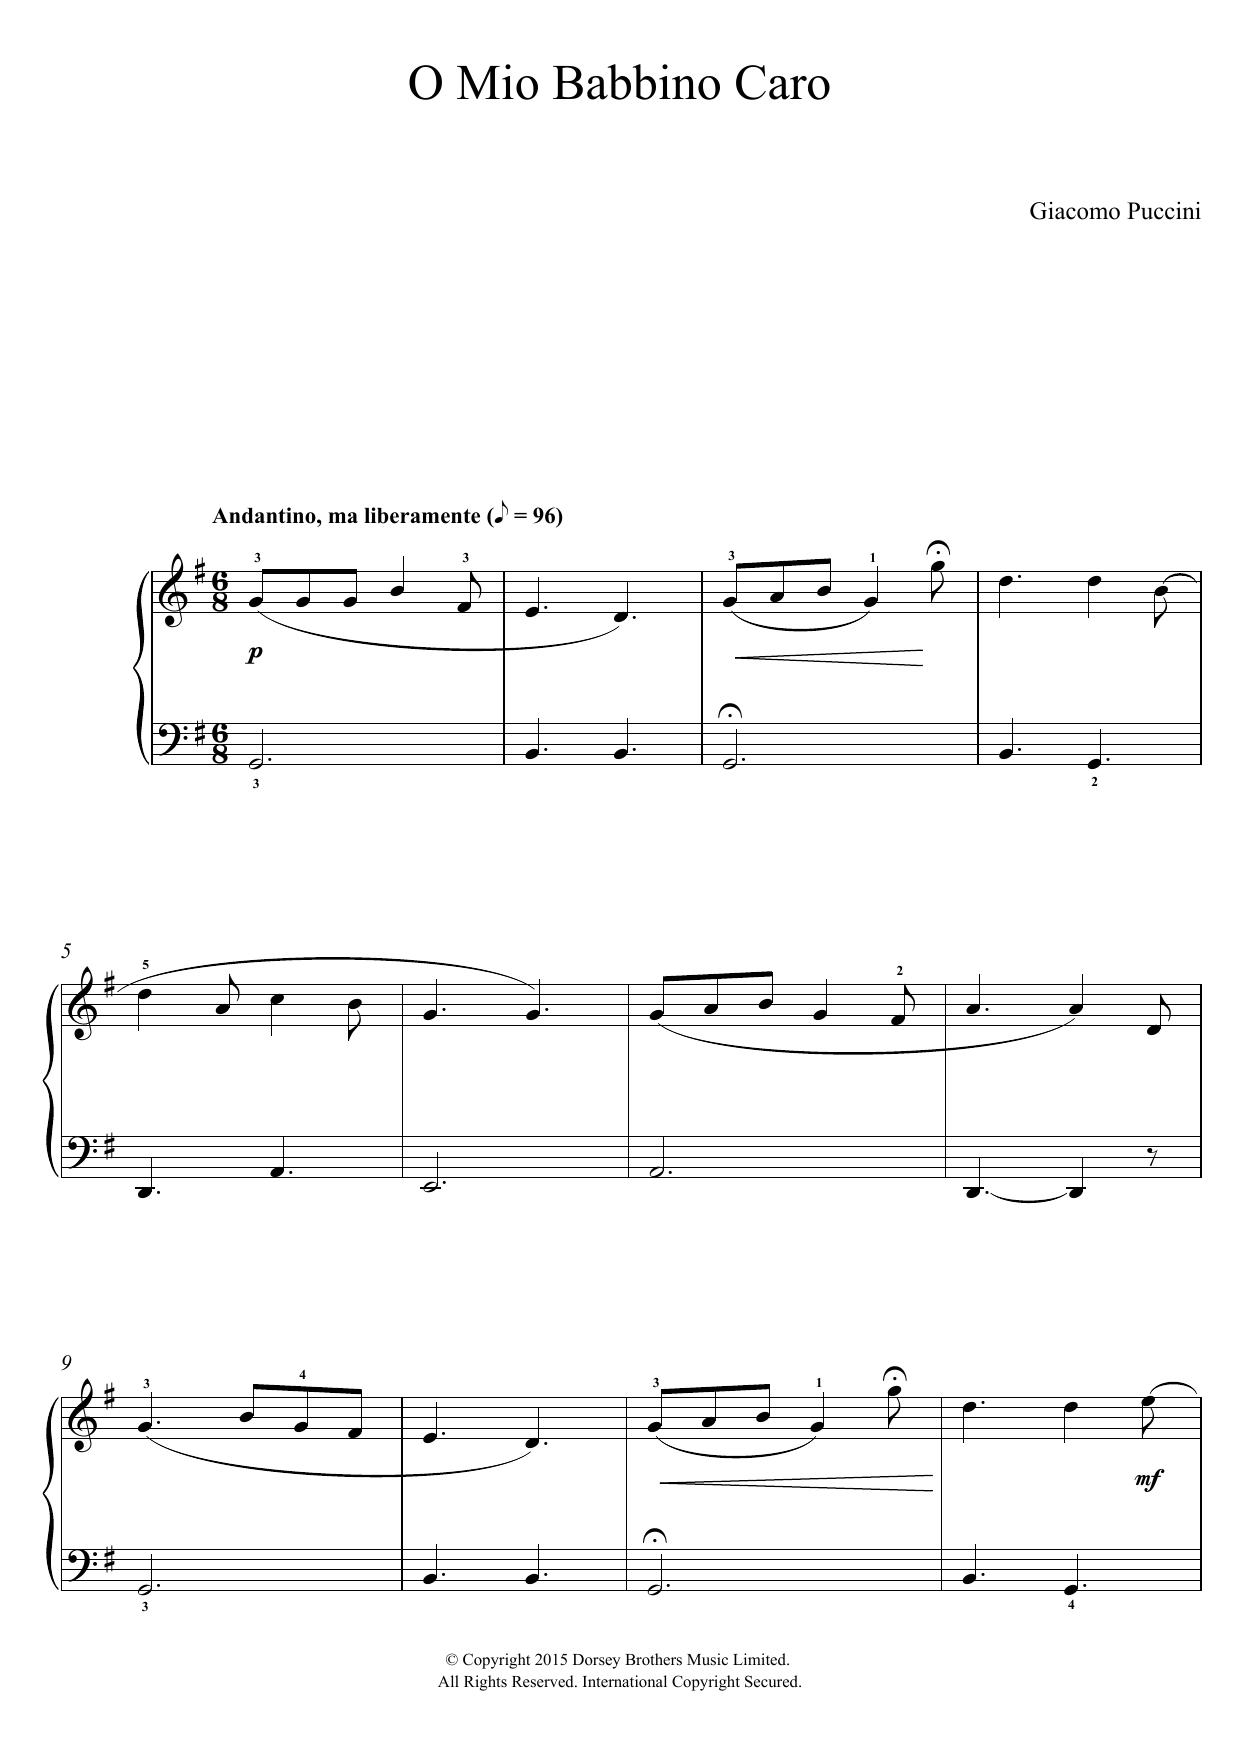 Giacomo Puccini - O Mio Babbino Caro (from Gianni Schicchi)